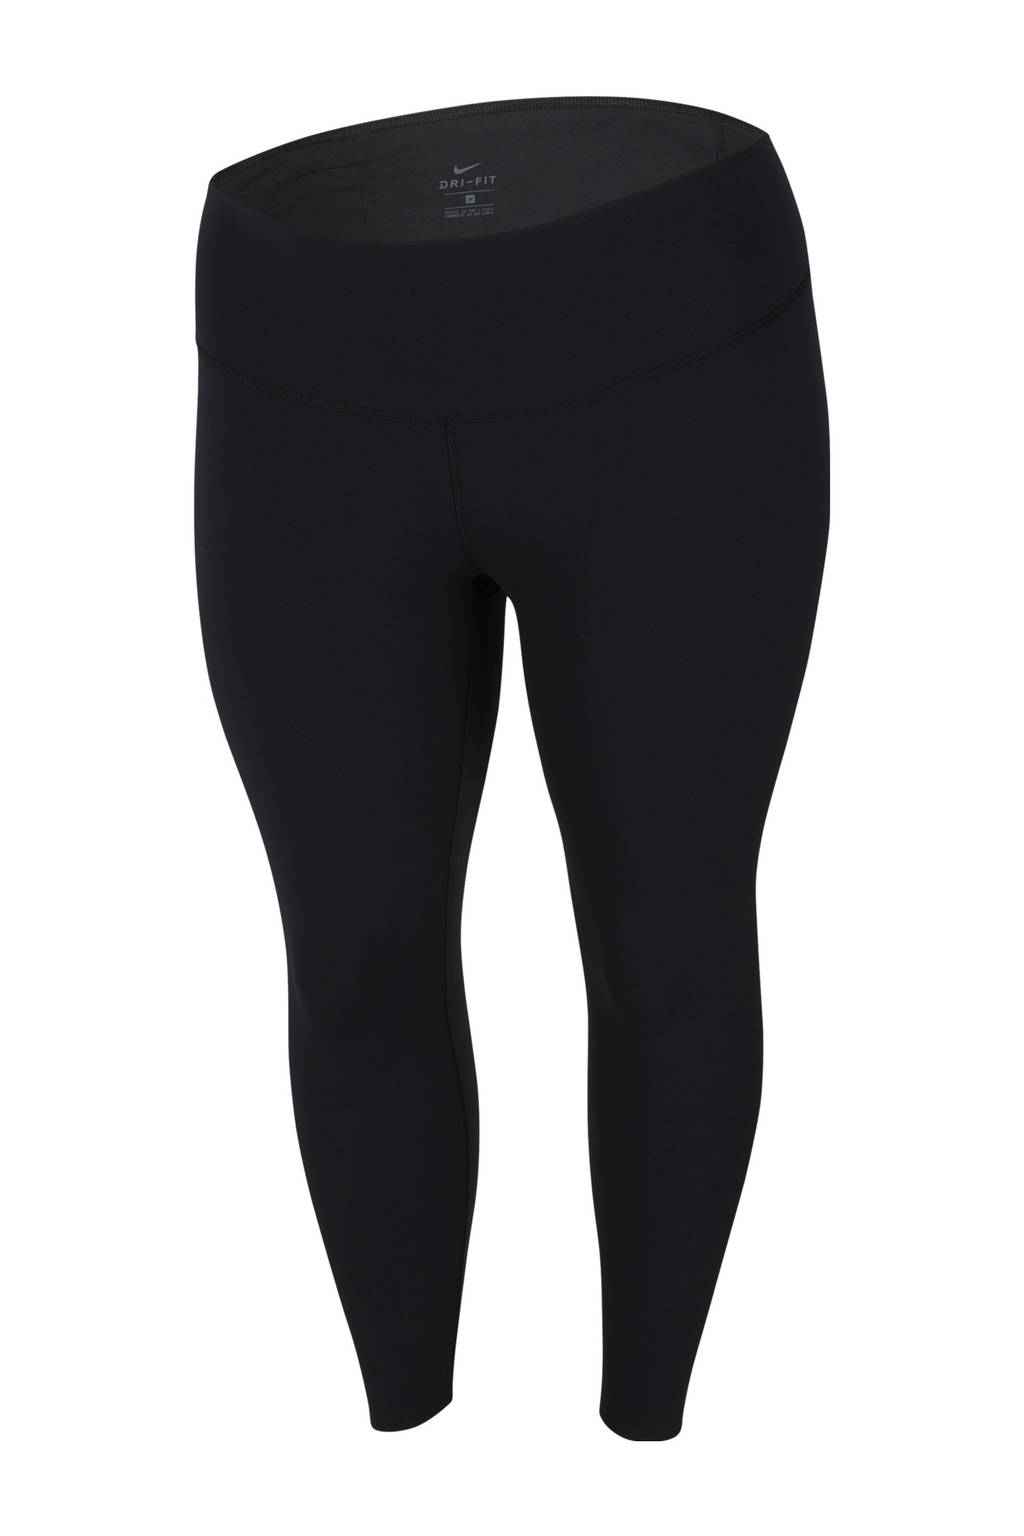 Nike Plus Size 7/8 sportlegging zwart, Zwart